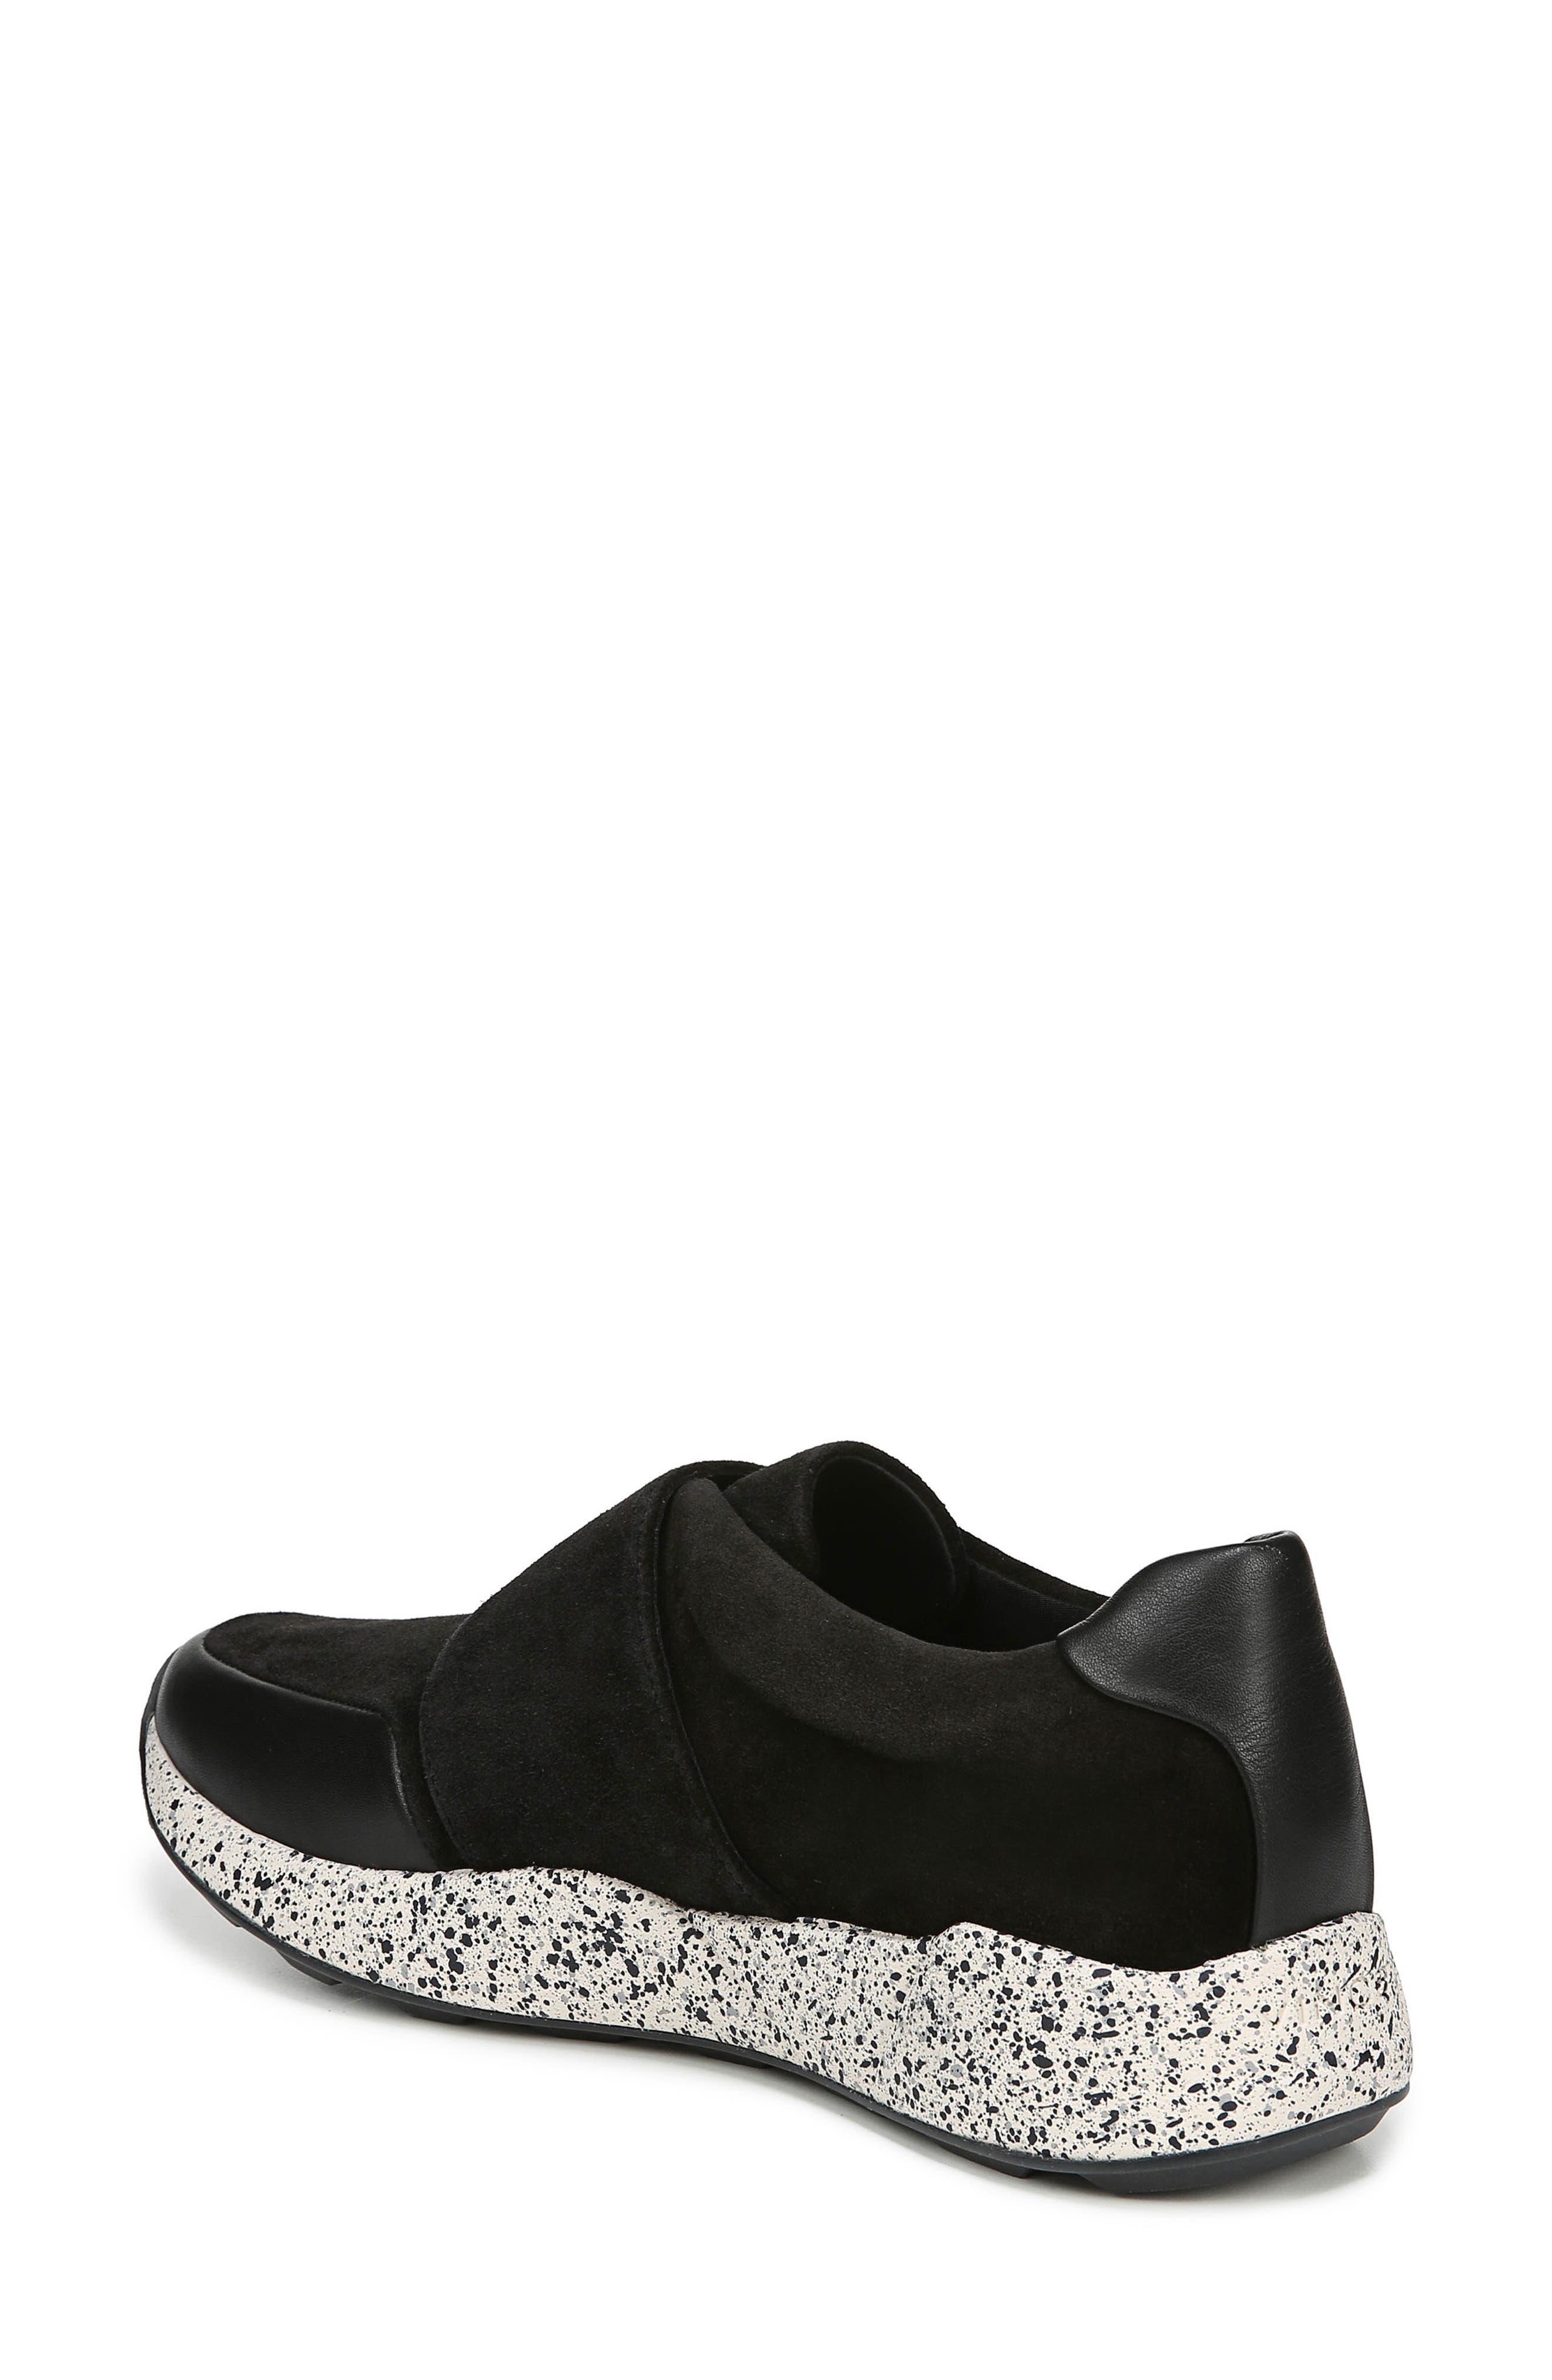 Gage Sneaker,                             Alternate thumbnail 2, color,                             BLACK COCO